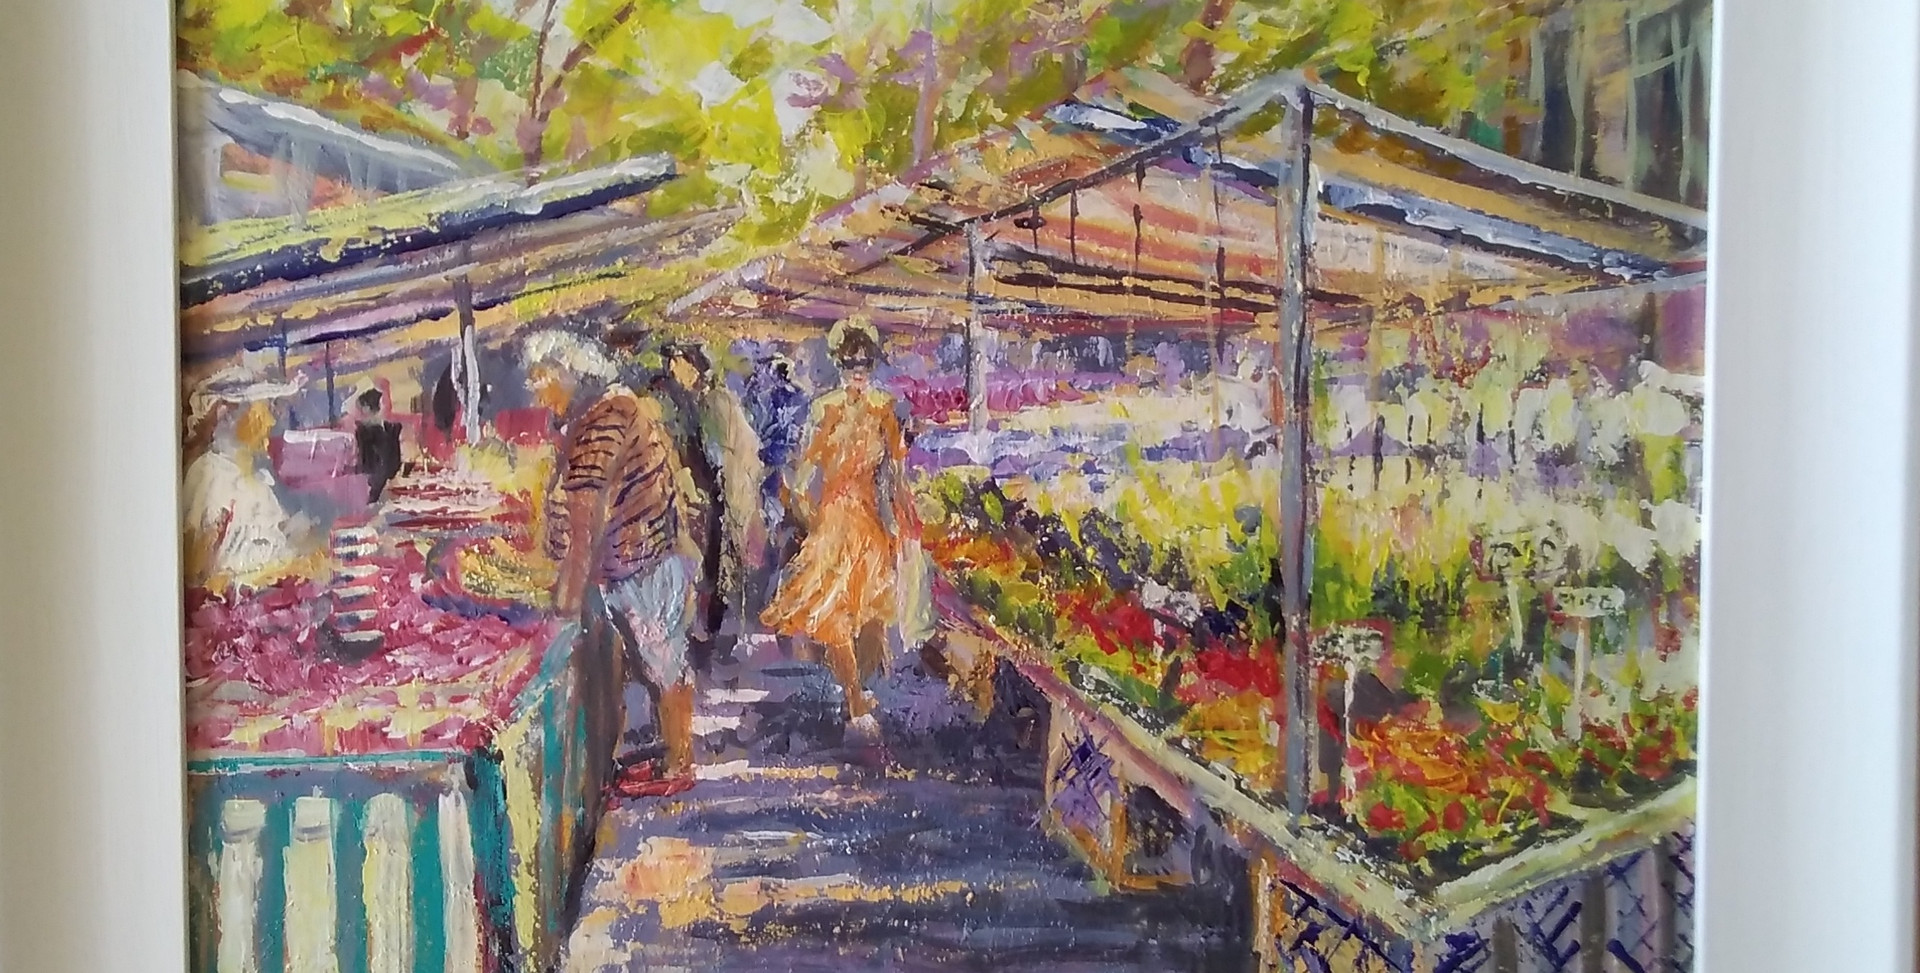 French Flower Market. Framed Acrylic on Wood. 62 x 52